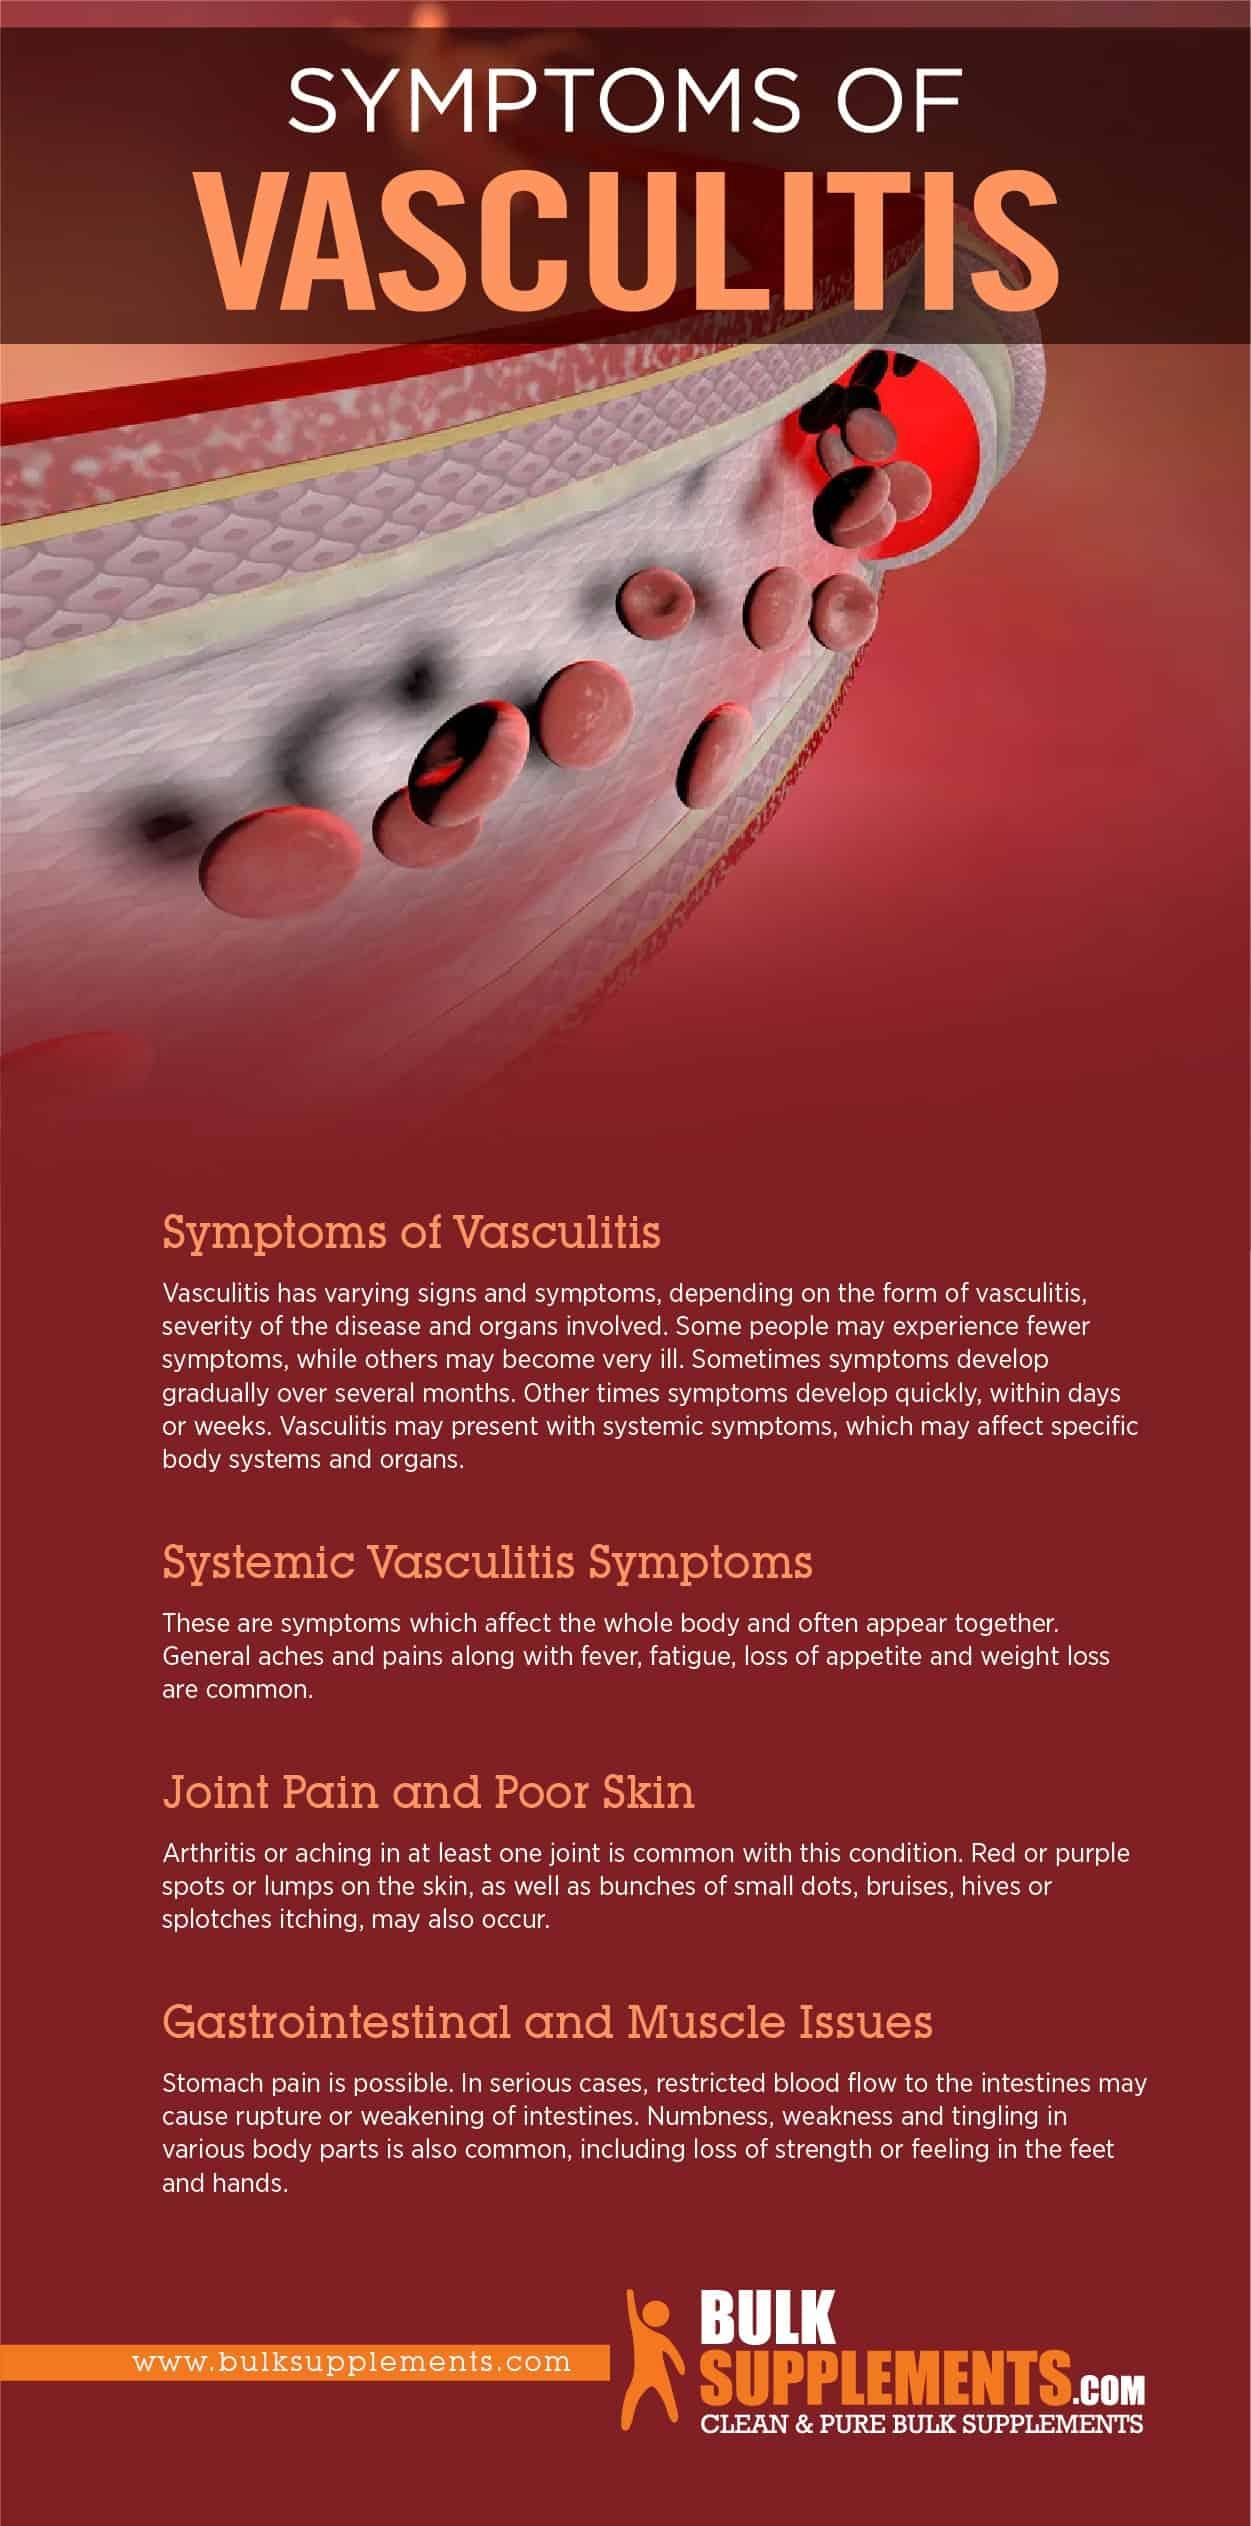 Symptoms of Vasculitis